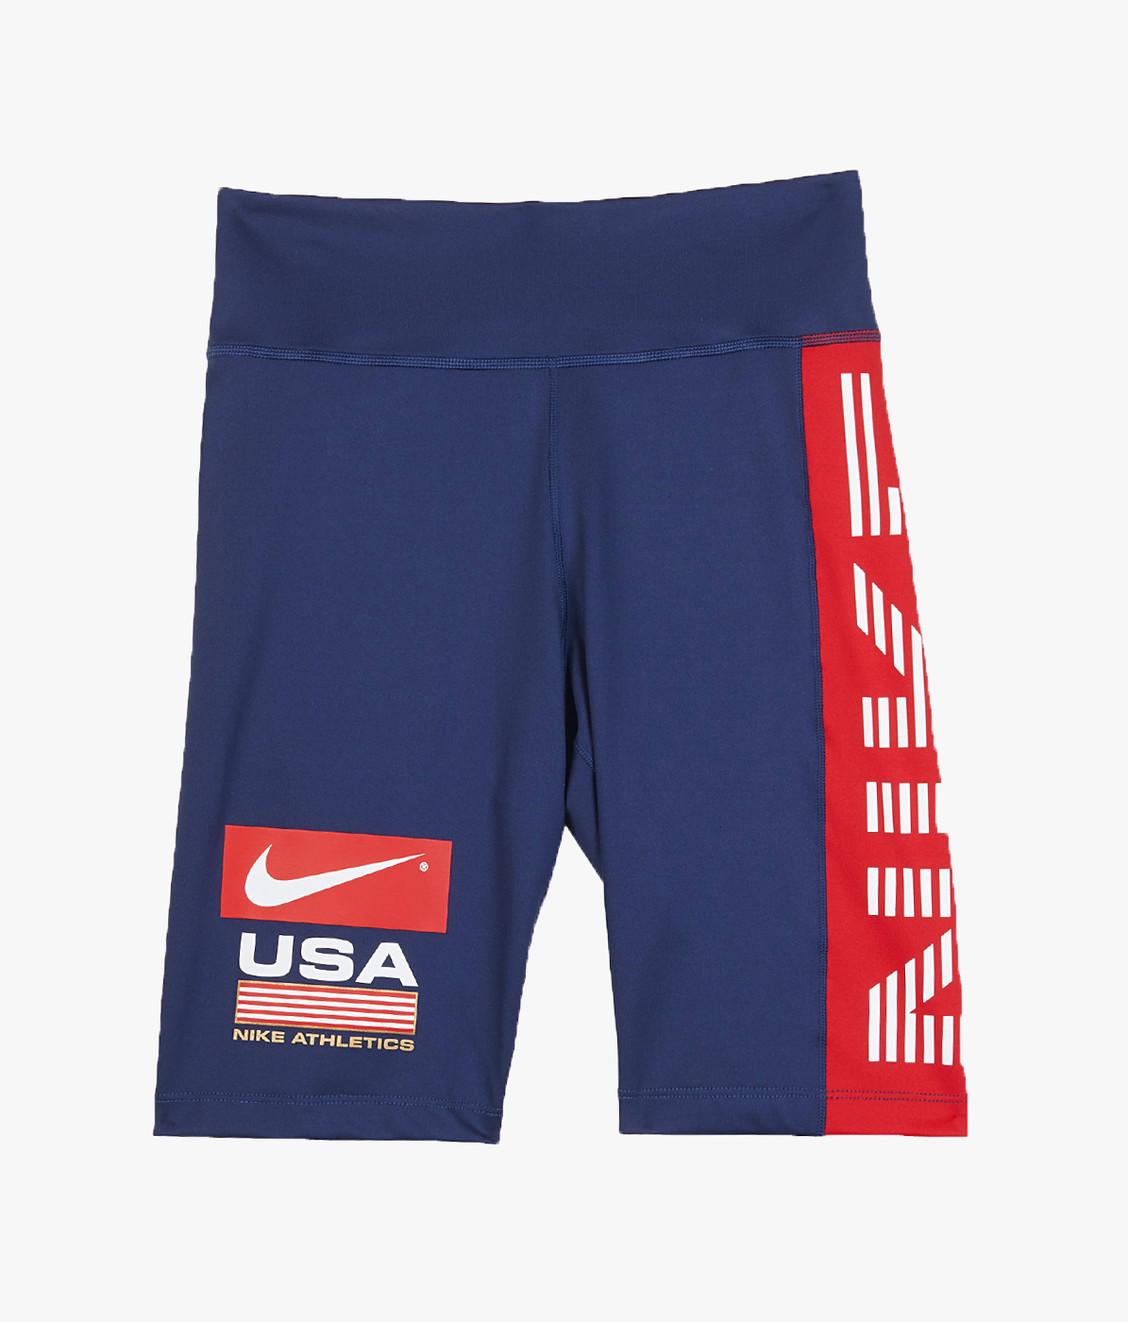 nike shorts usa